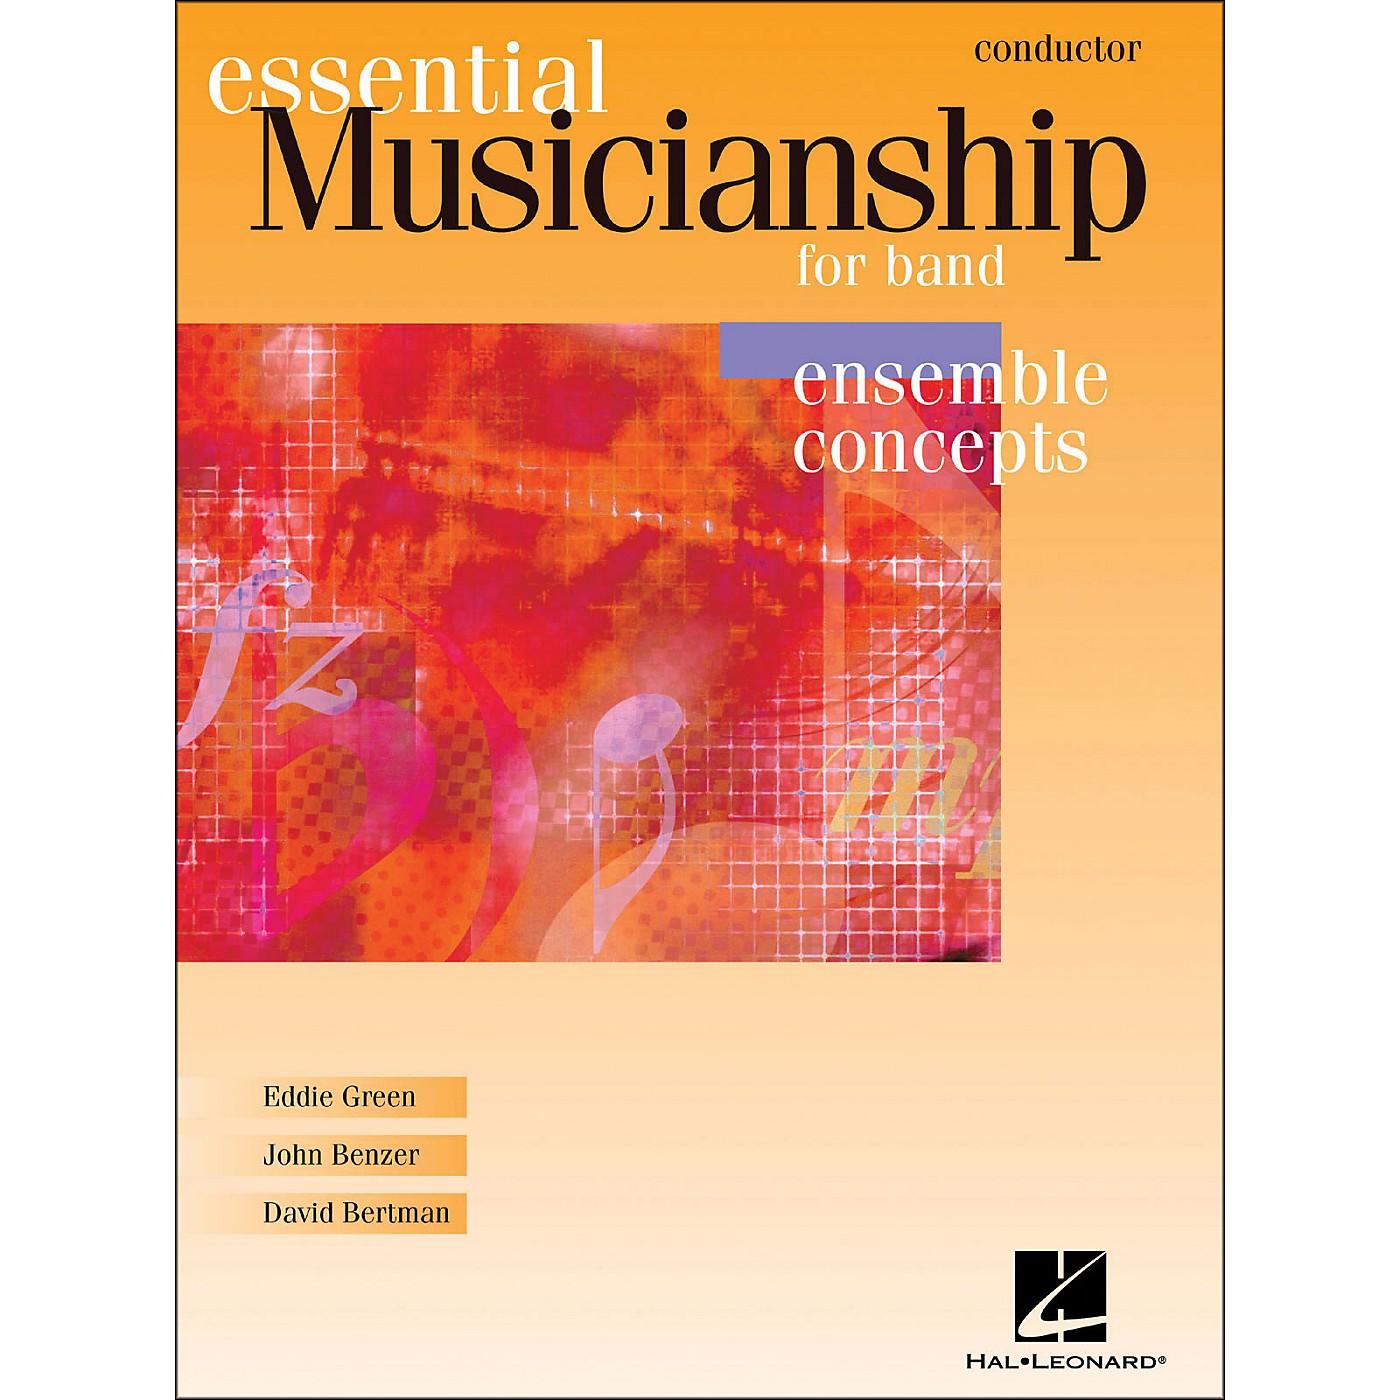 Hal Leonard Essential Musicianship for Band - Ensemble Concepts Conductor thumbnail